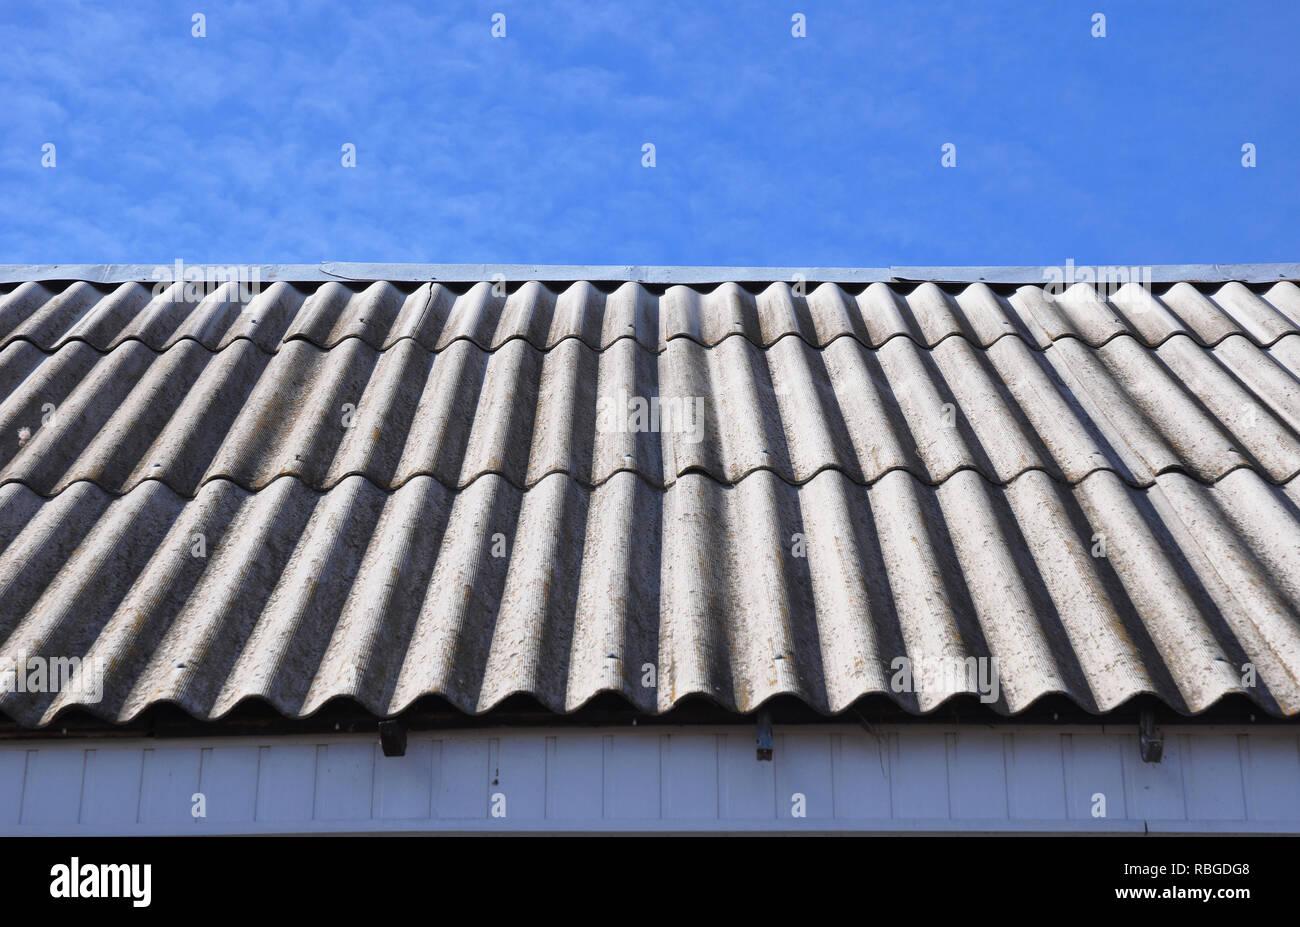 Asbest Dach Haus Asbest Dach Stockfoto Bild 230857880 Alamy